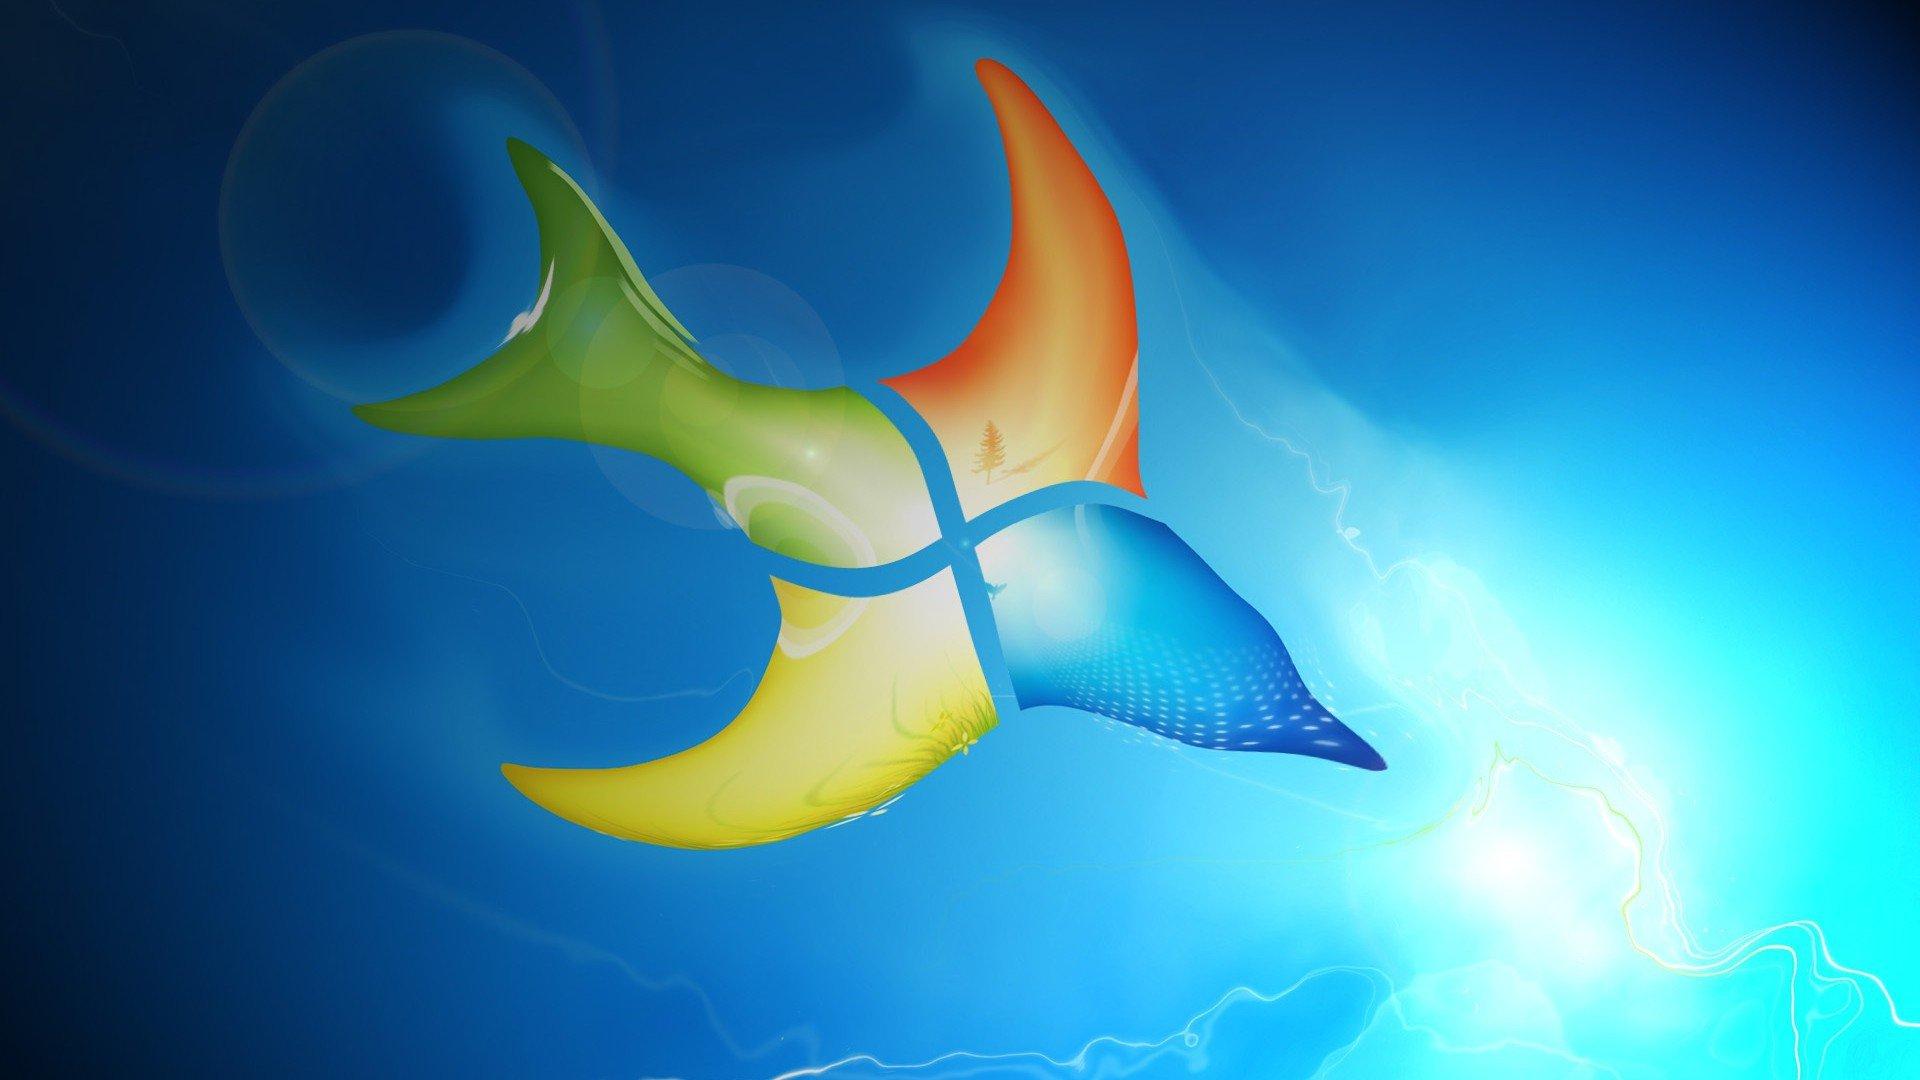 Windows 7 Fish Art, HD Computer, 4k Wallpapers, Images